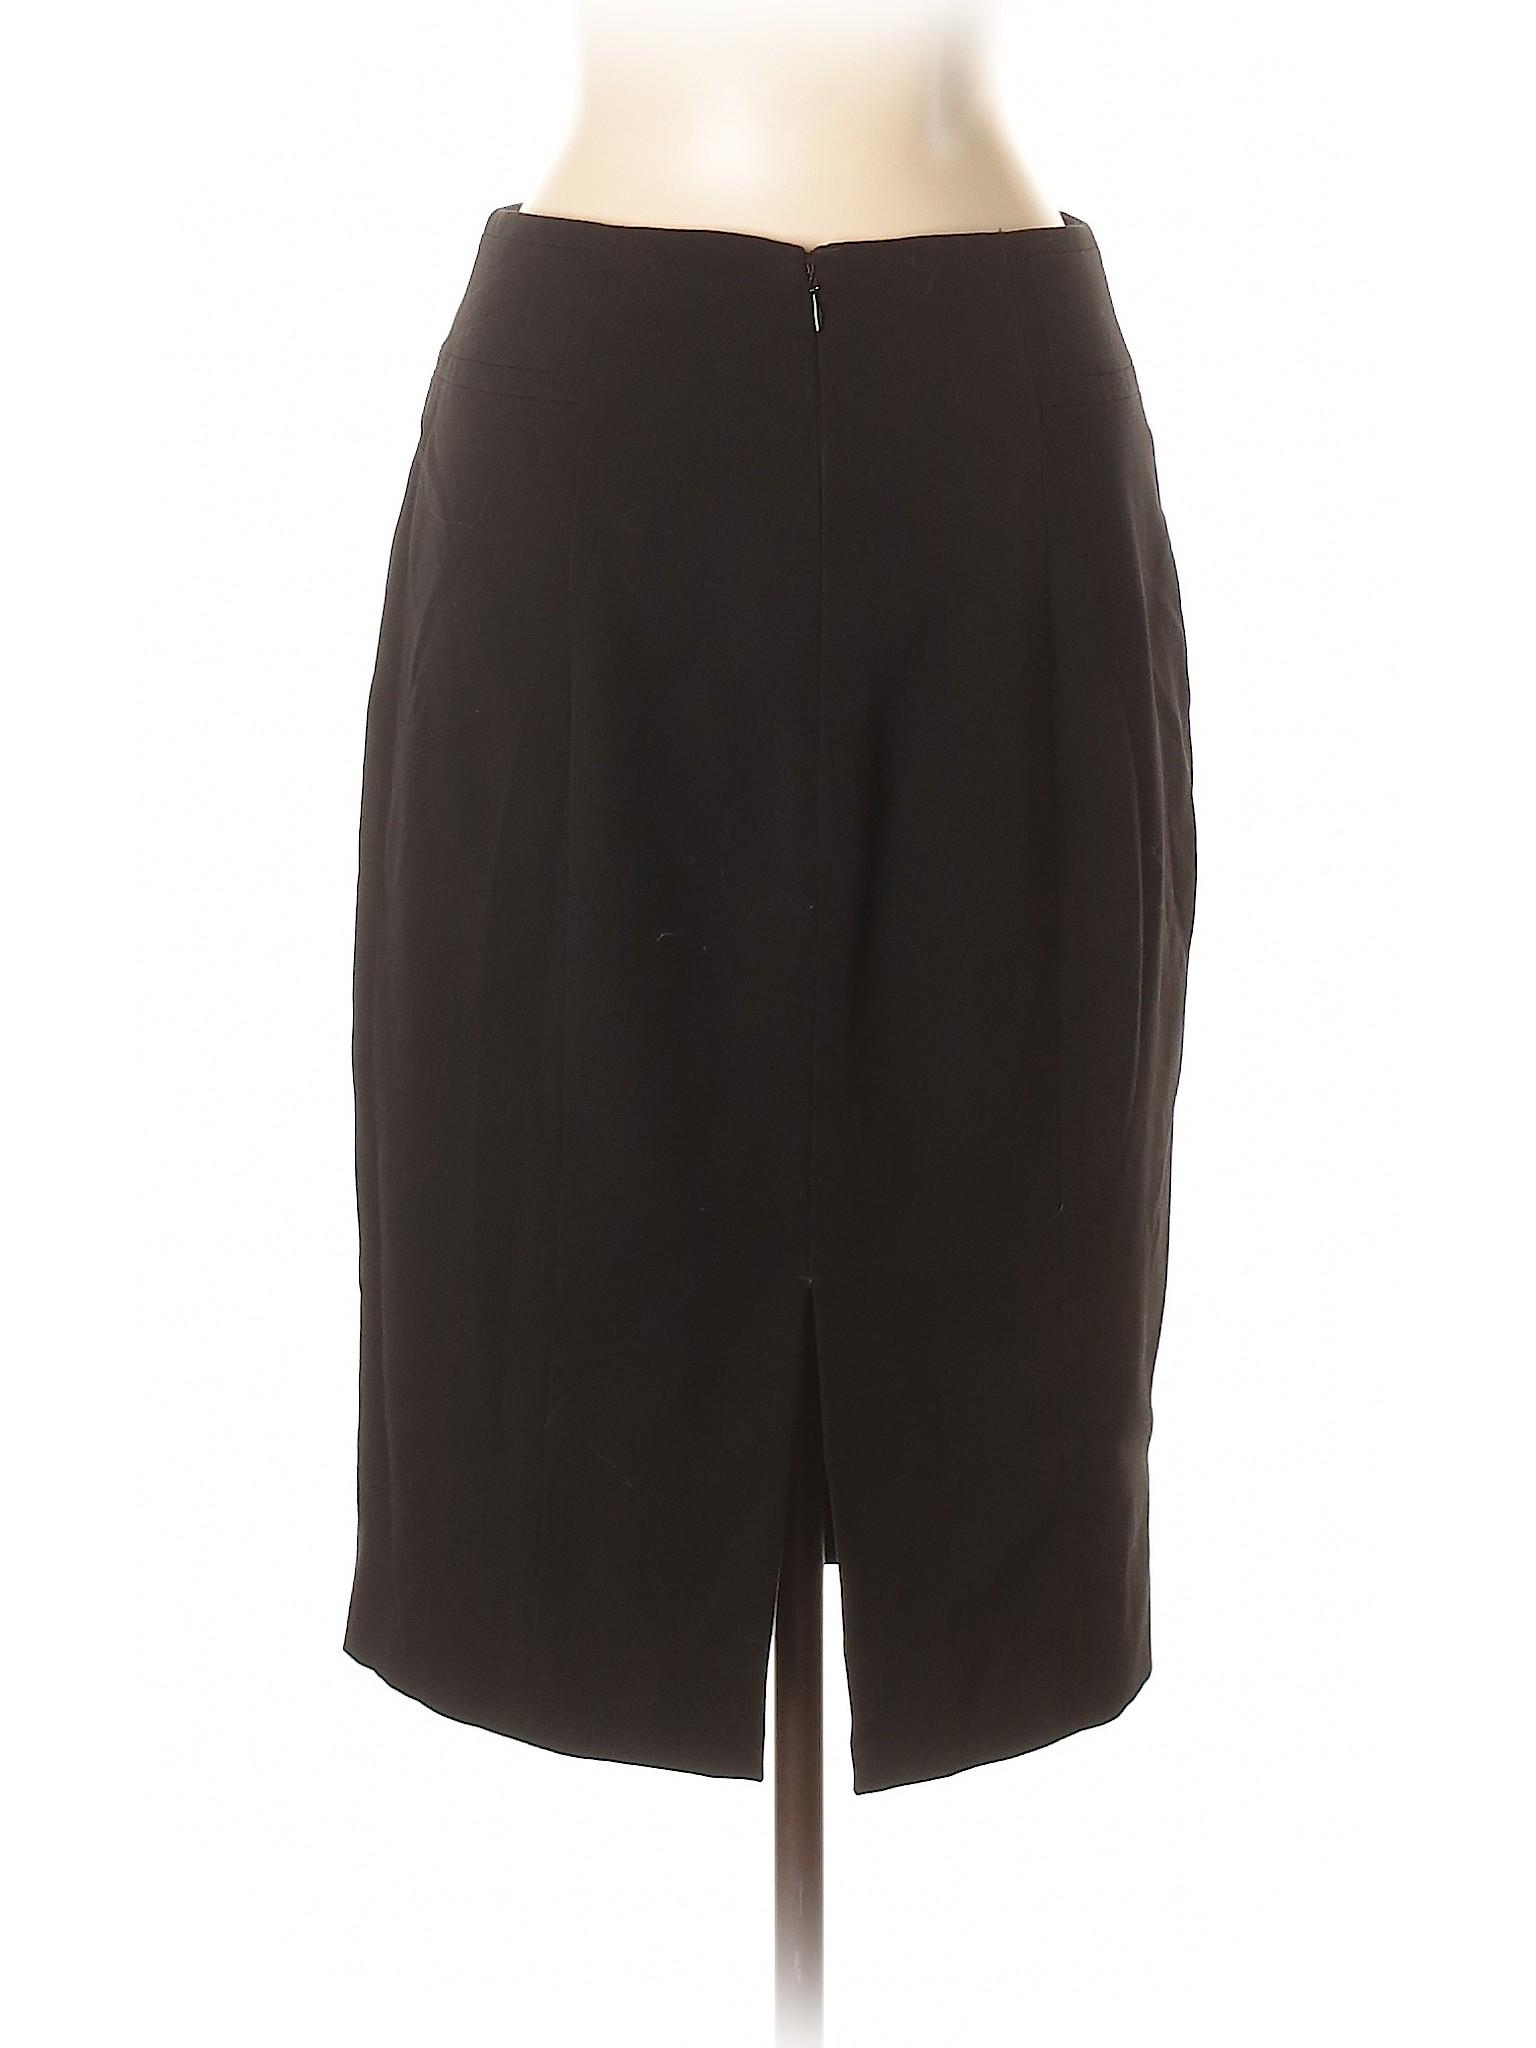 Market Casual Black House Boutique Skirt White Leisure wfHqPgaT